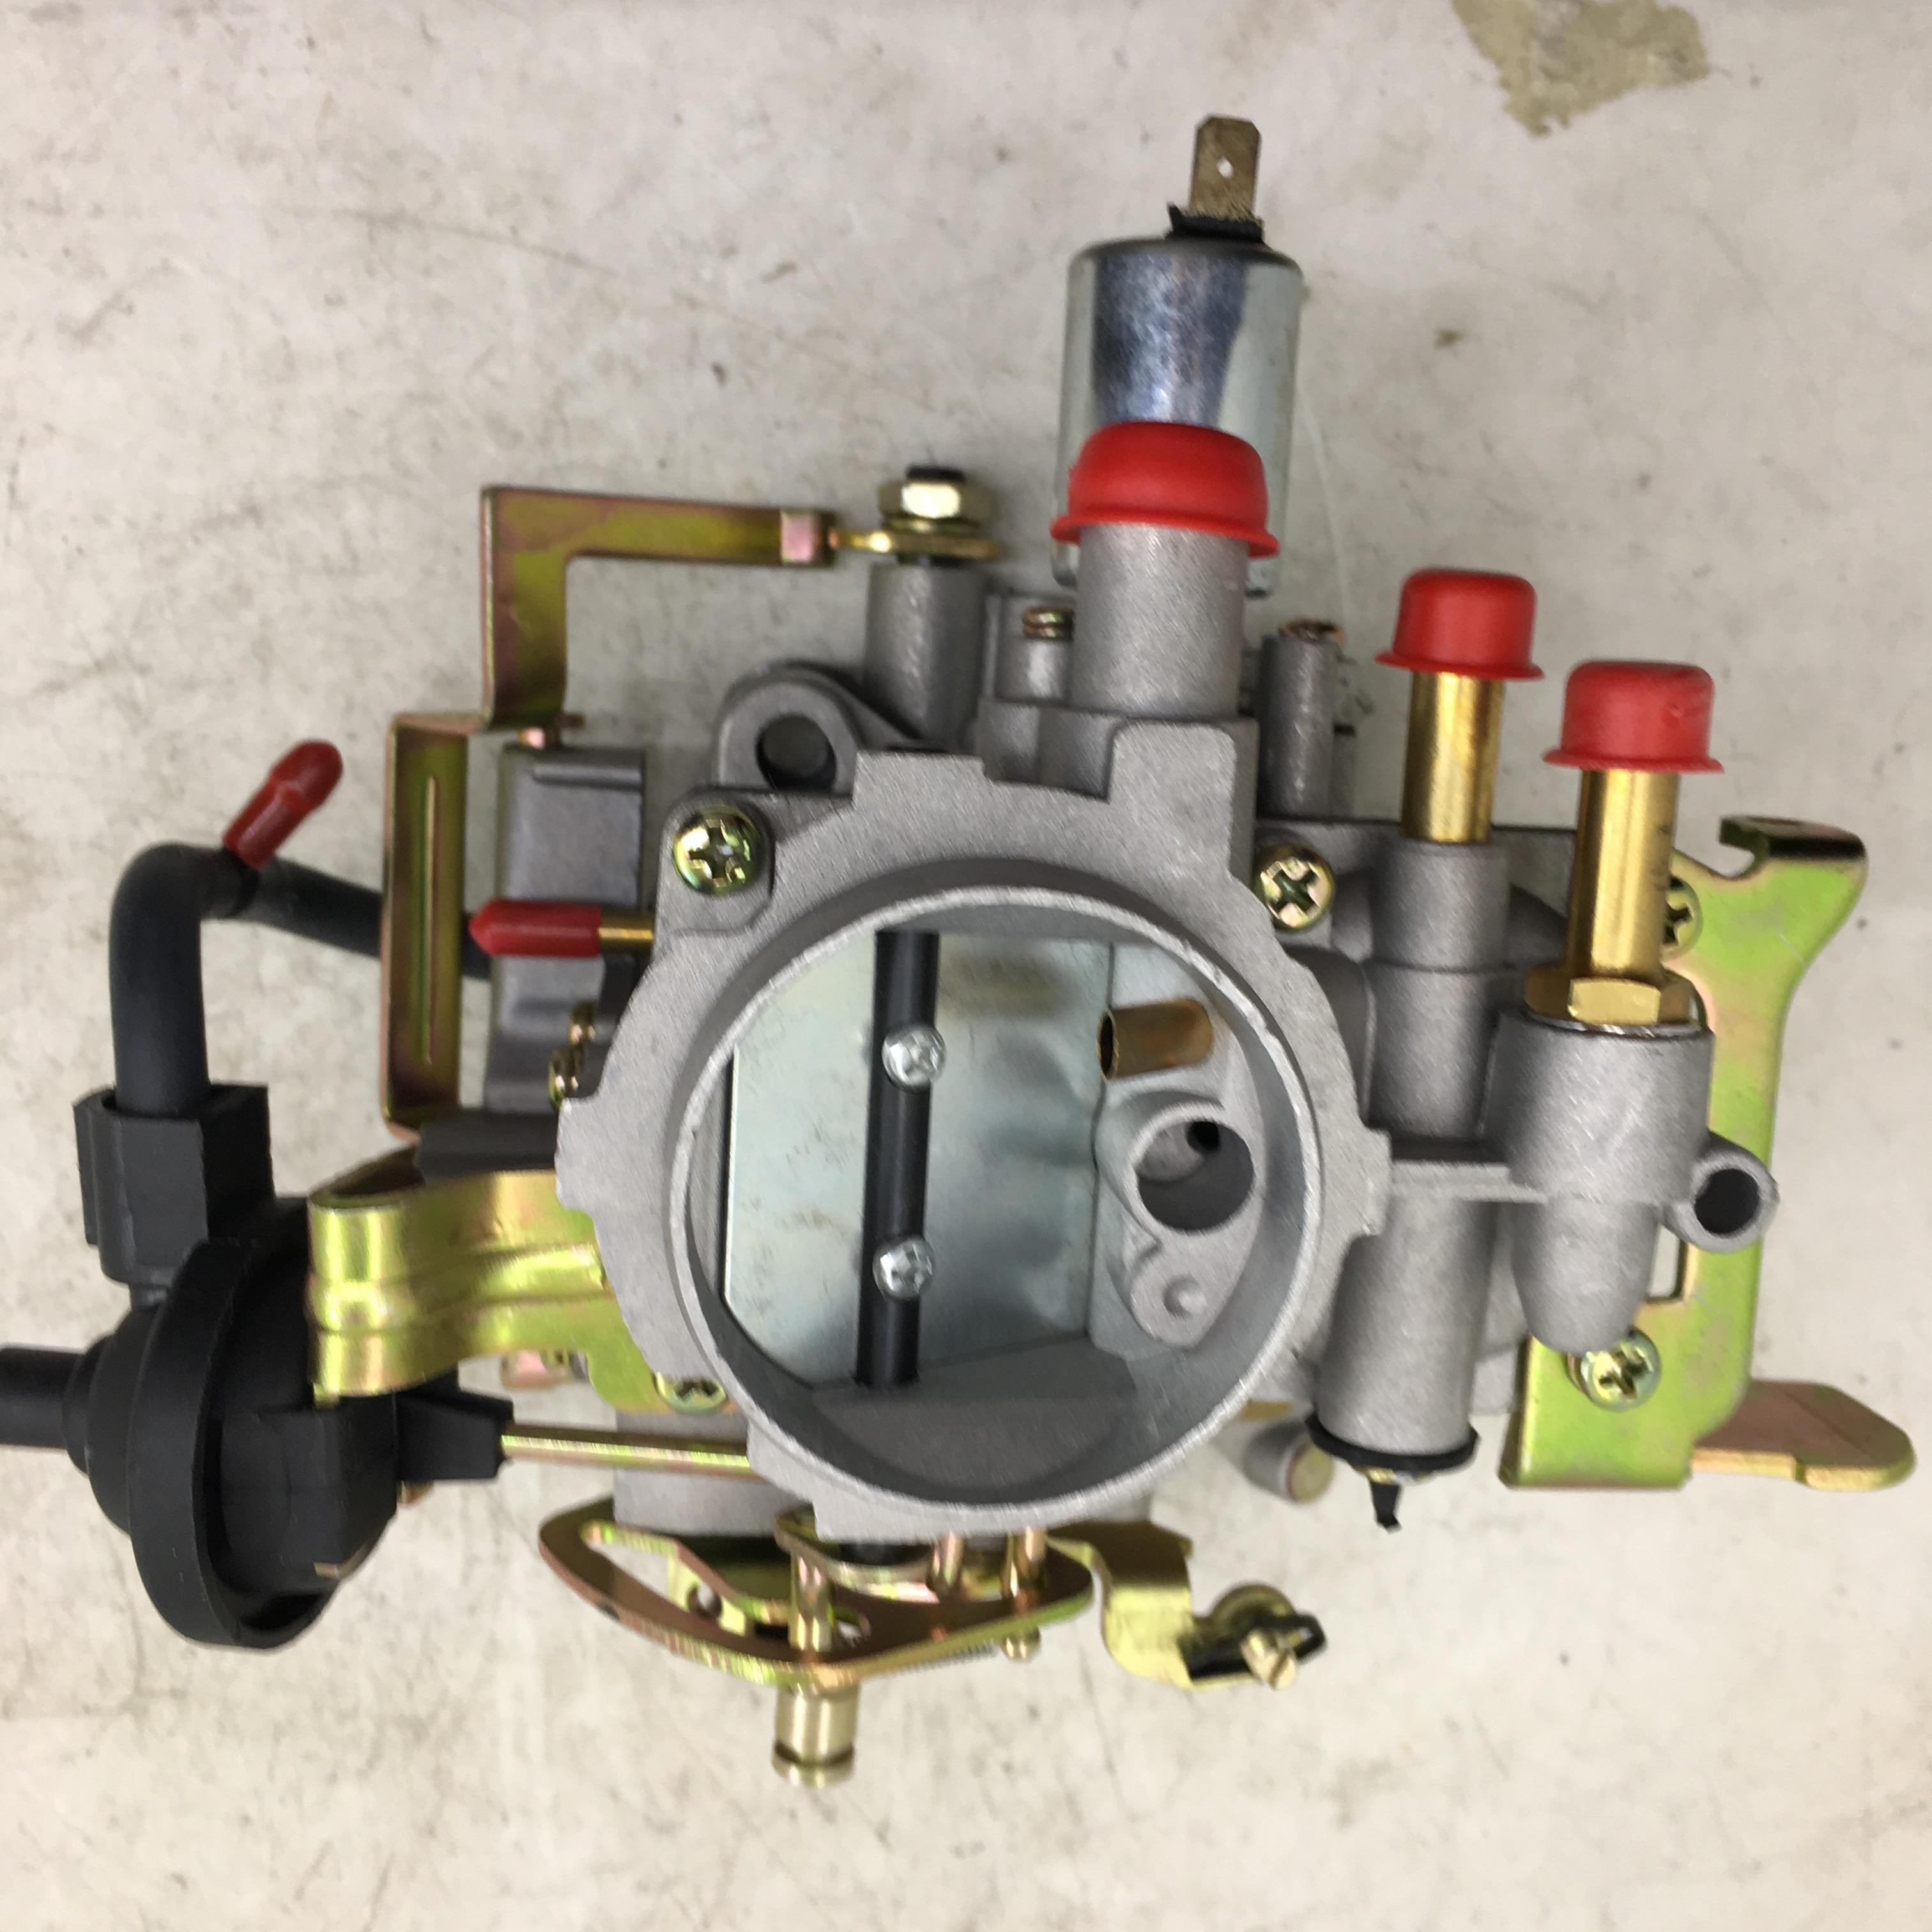 SherryBerg carbohidratos para SOLEX 32 32mm carburador para Renault express PEUGEOT CITROEN carburador para RENAULT R5 R9 R11